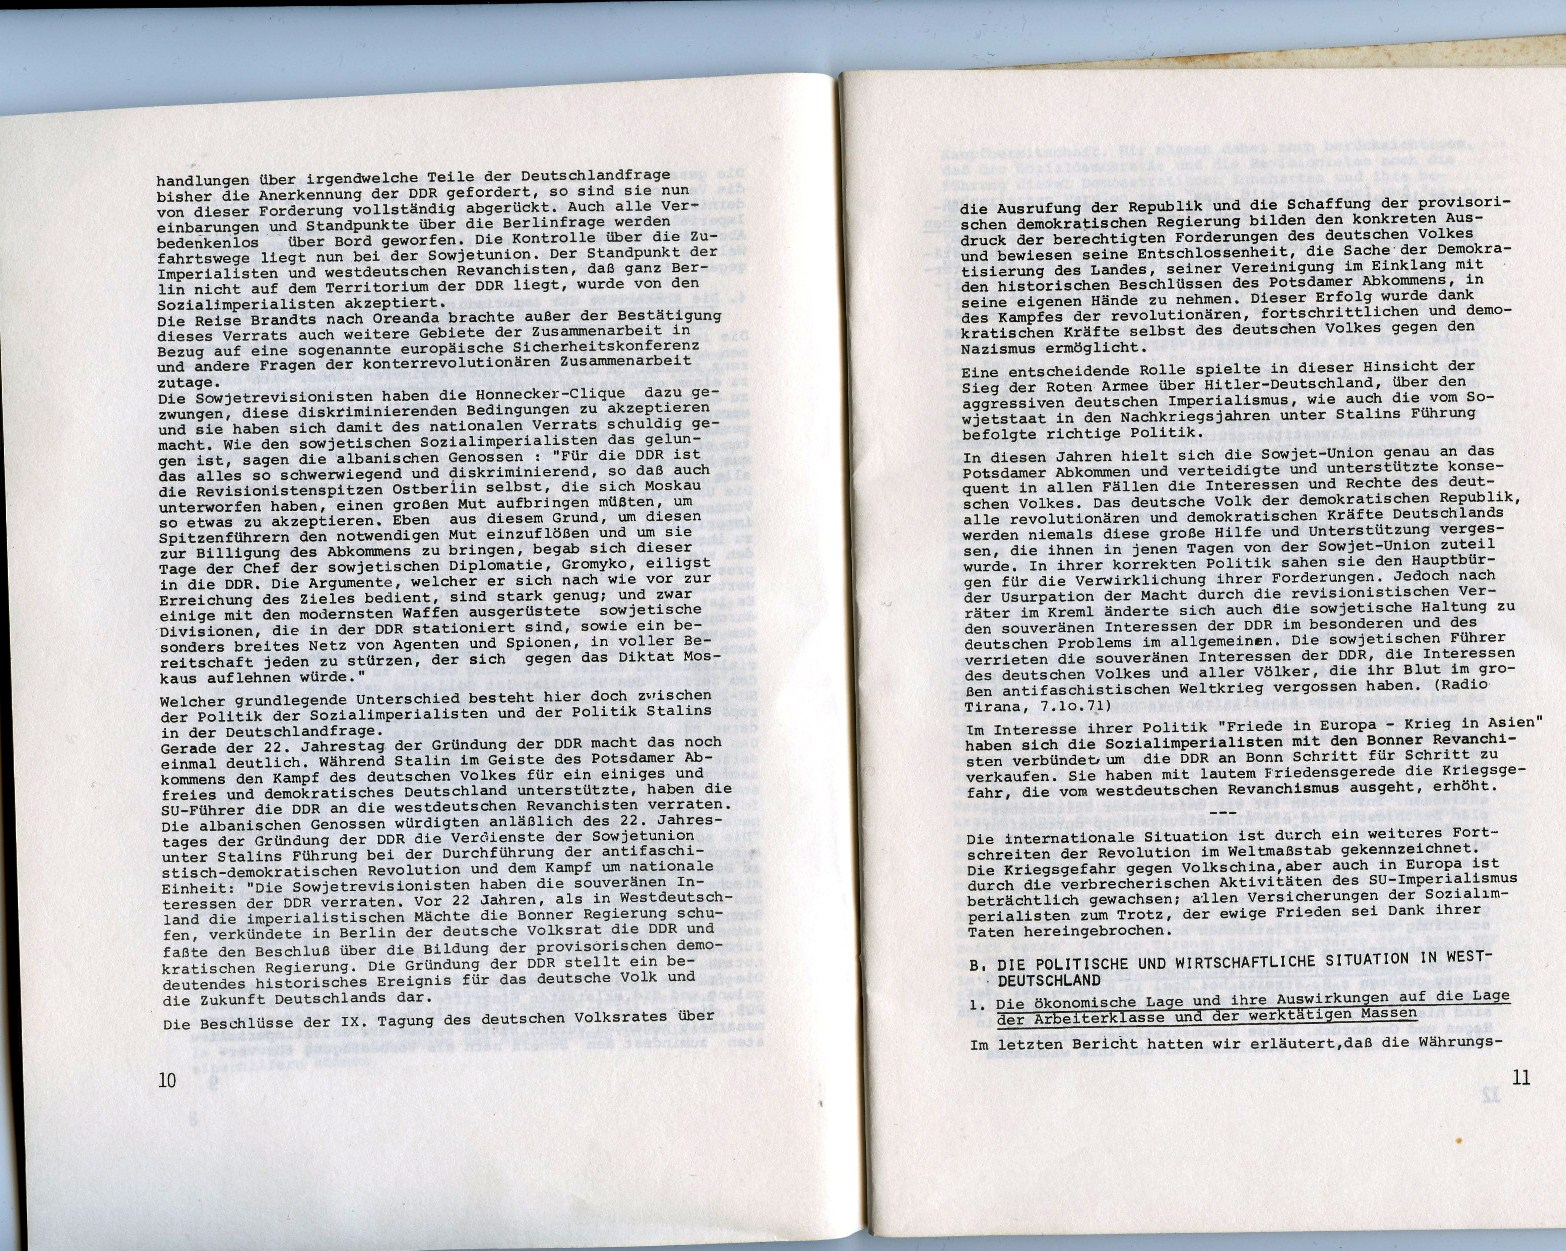 ZB_Parteiarbeiter_1971_09_06